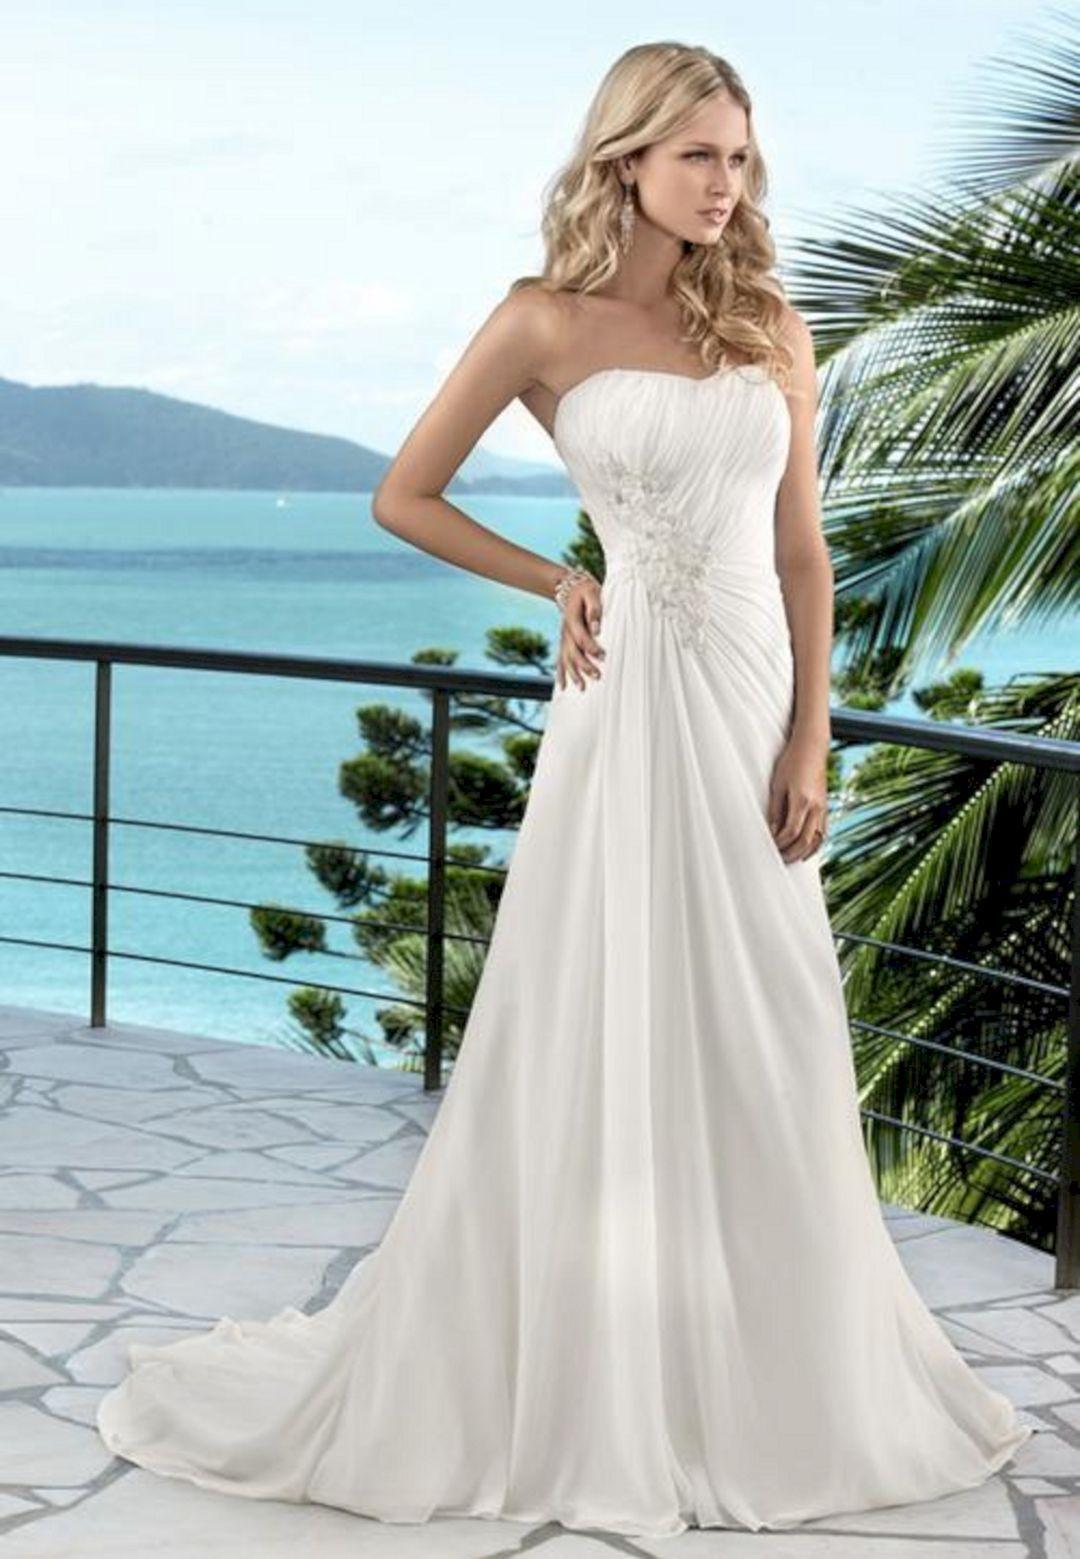 15 Gorgeous Sweetheart Neckline Summer Dresses For Bride Looks More Pretty Summer Wedding Dress Chiffon Wedding Dress Beach Wedding Dresses [ 1559 x 1080 Pixel ]